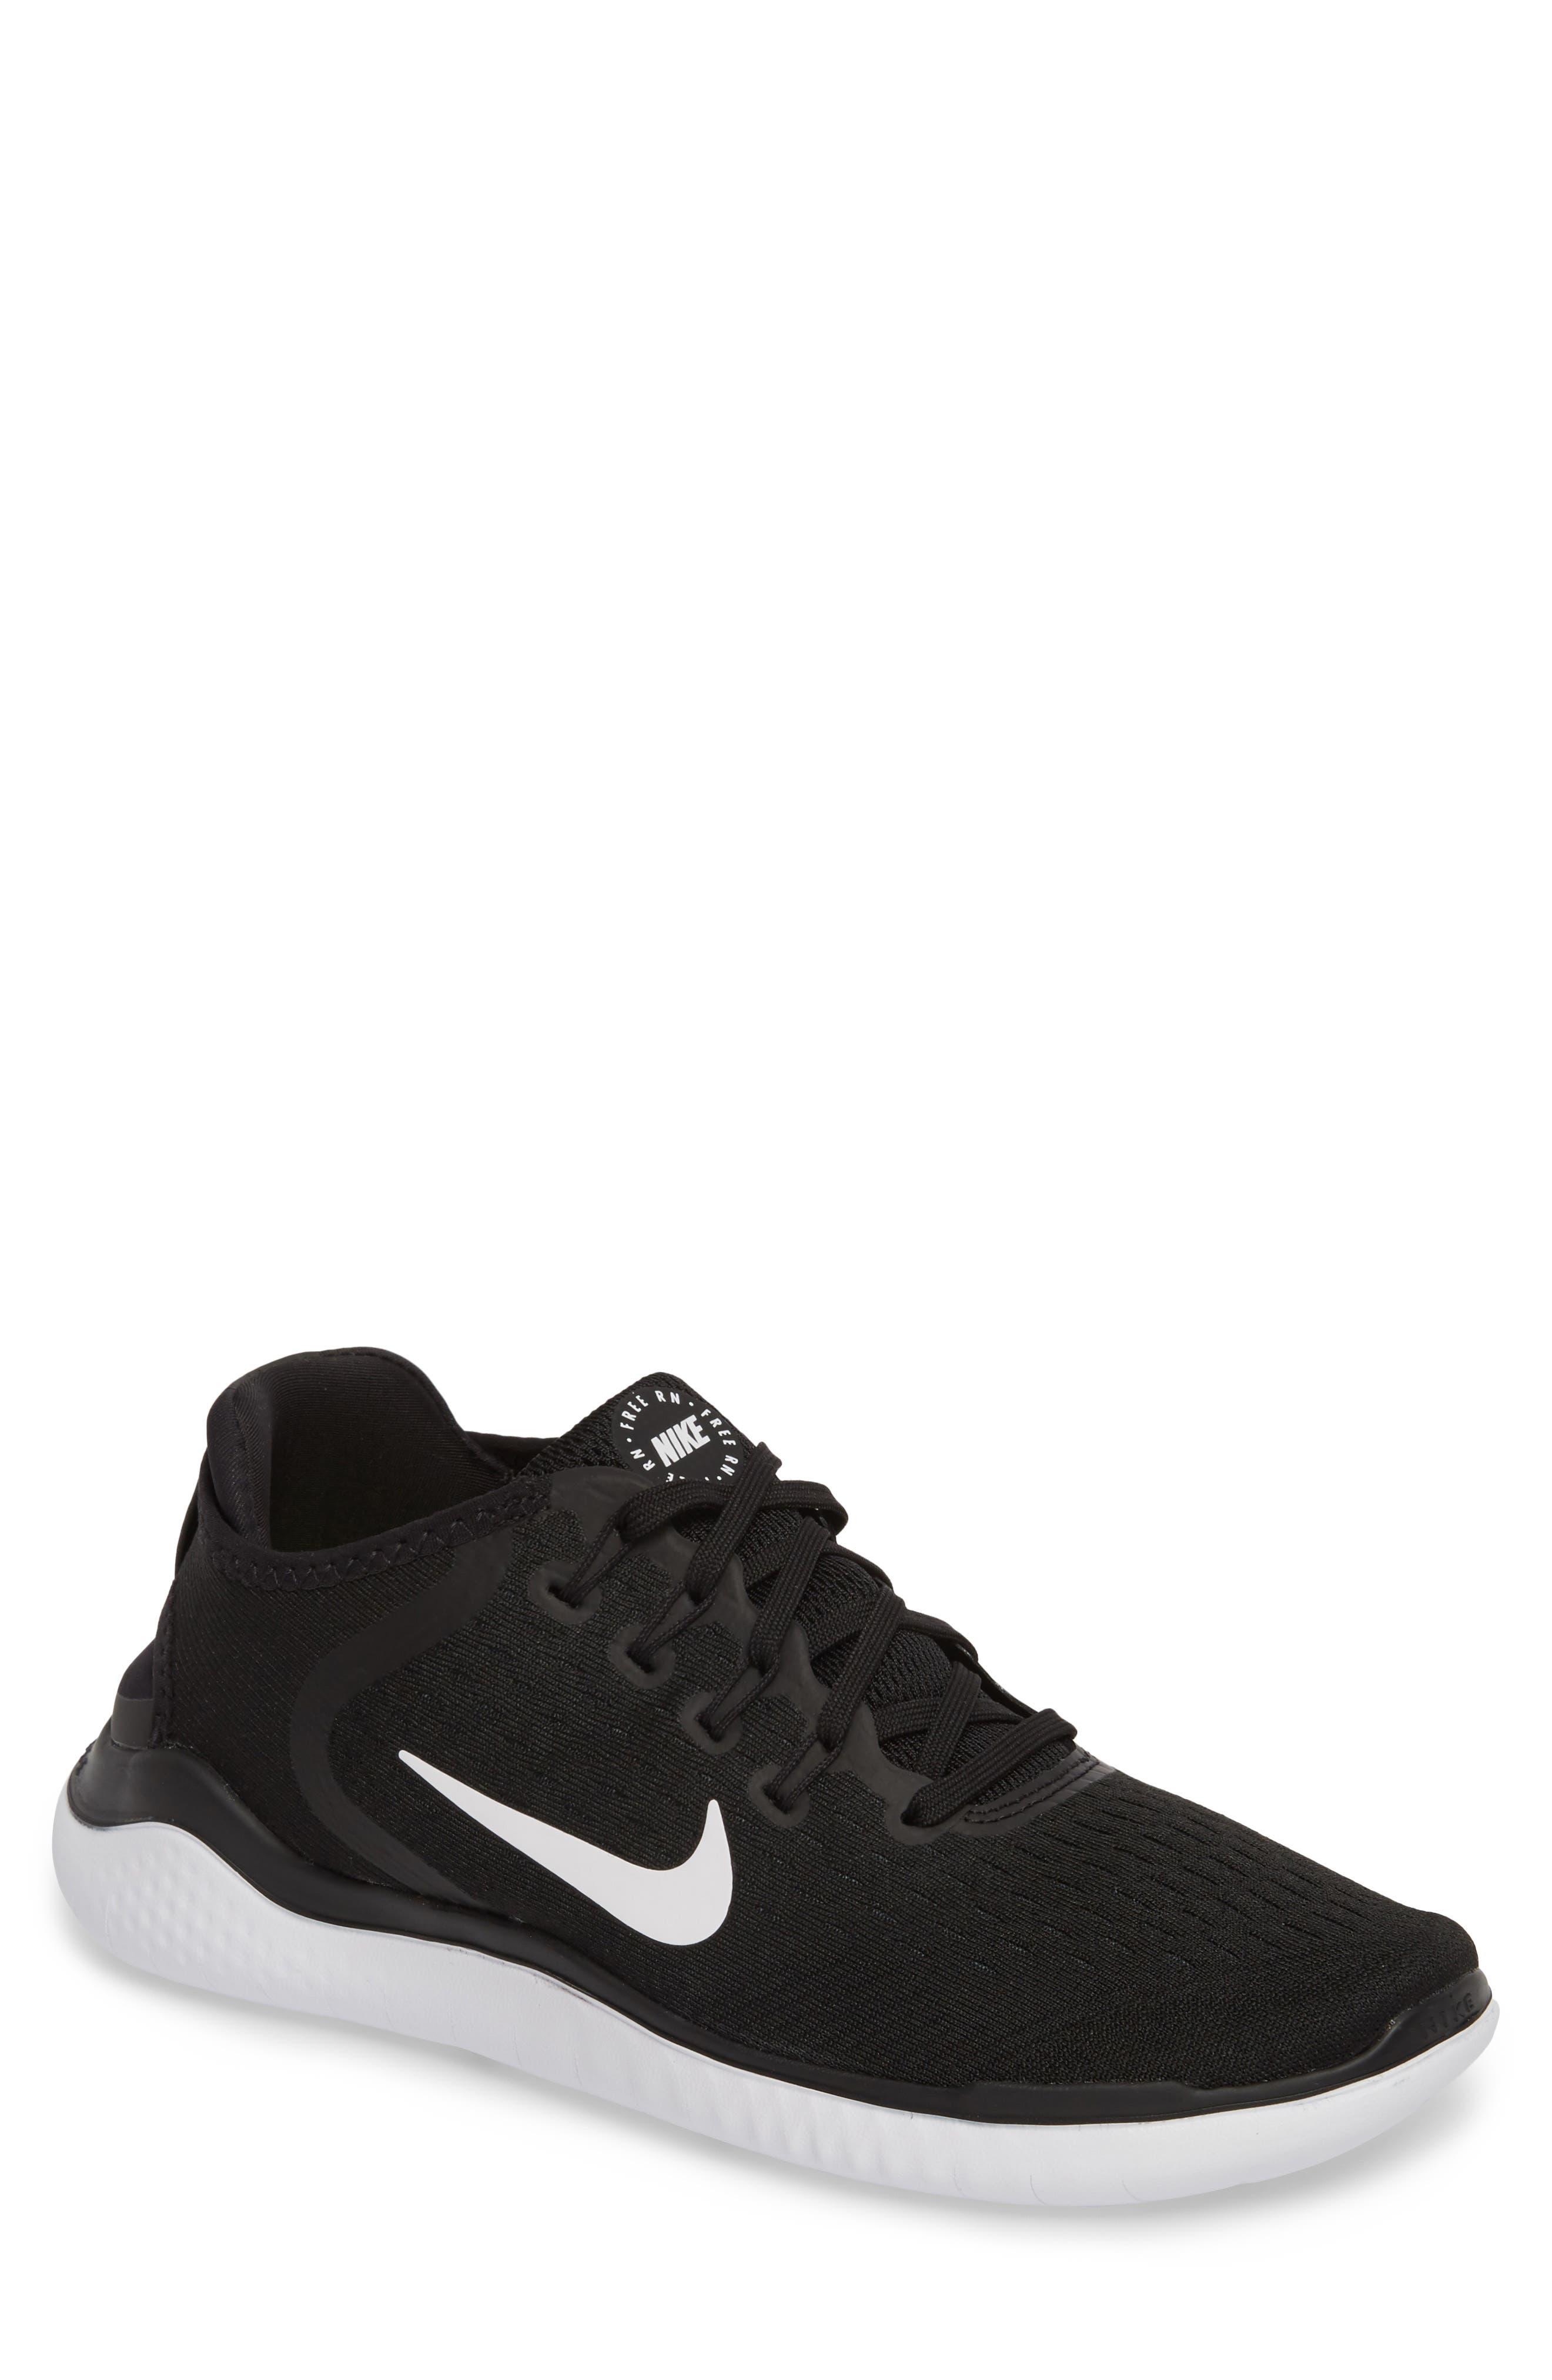 Free RN 2018 Running Shoe,                             Main thumbnail 1, color,                             BLACK/ WHITE